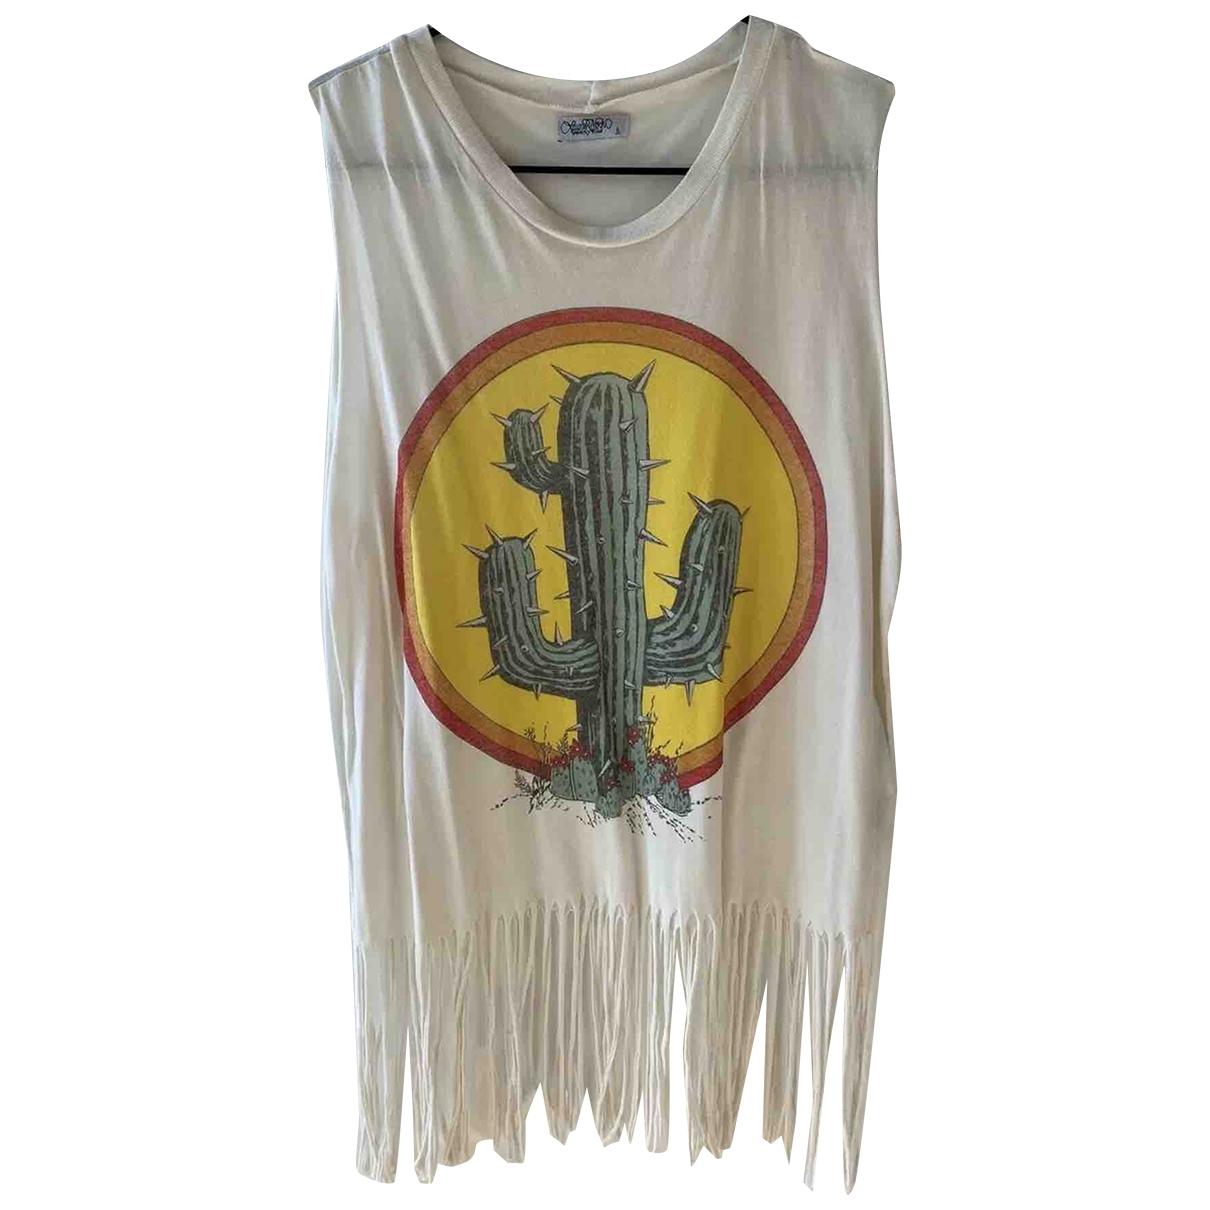 Camiseta sin mangas Hippie Chic Non Signe / Unsigned